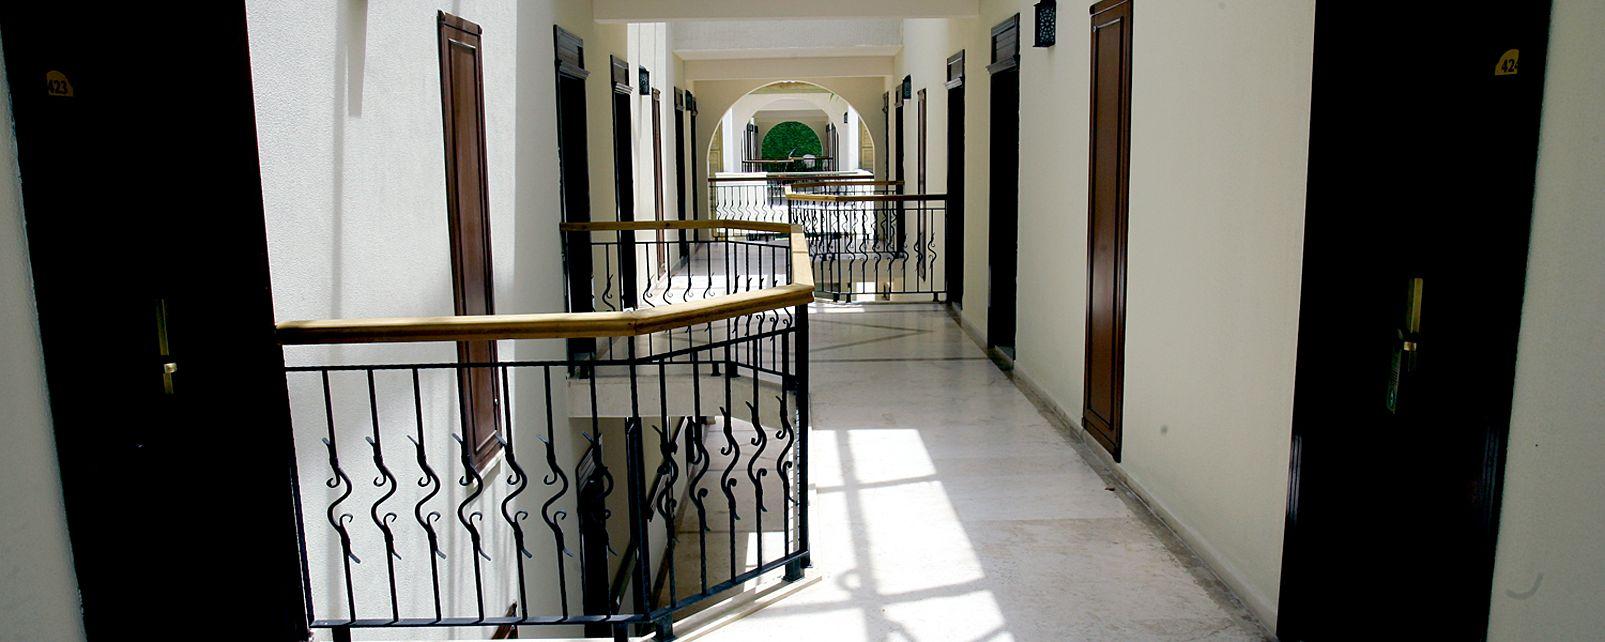 Hotel Papillon Muna